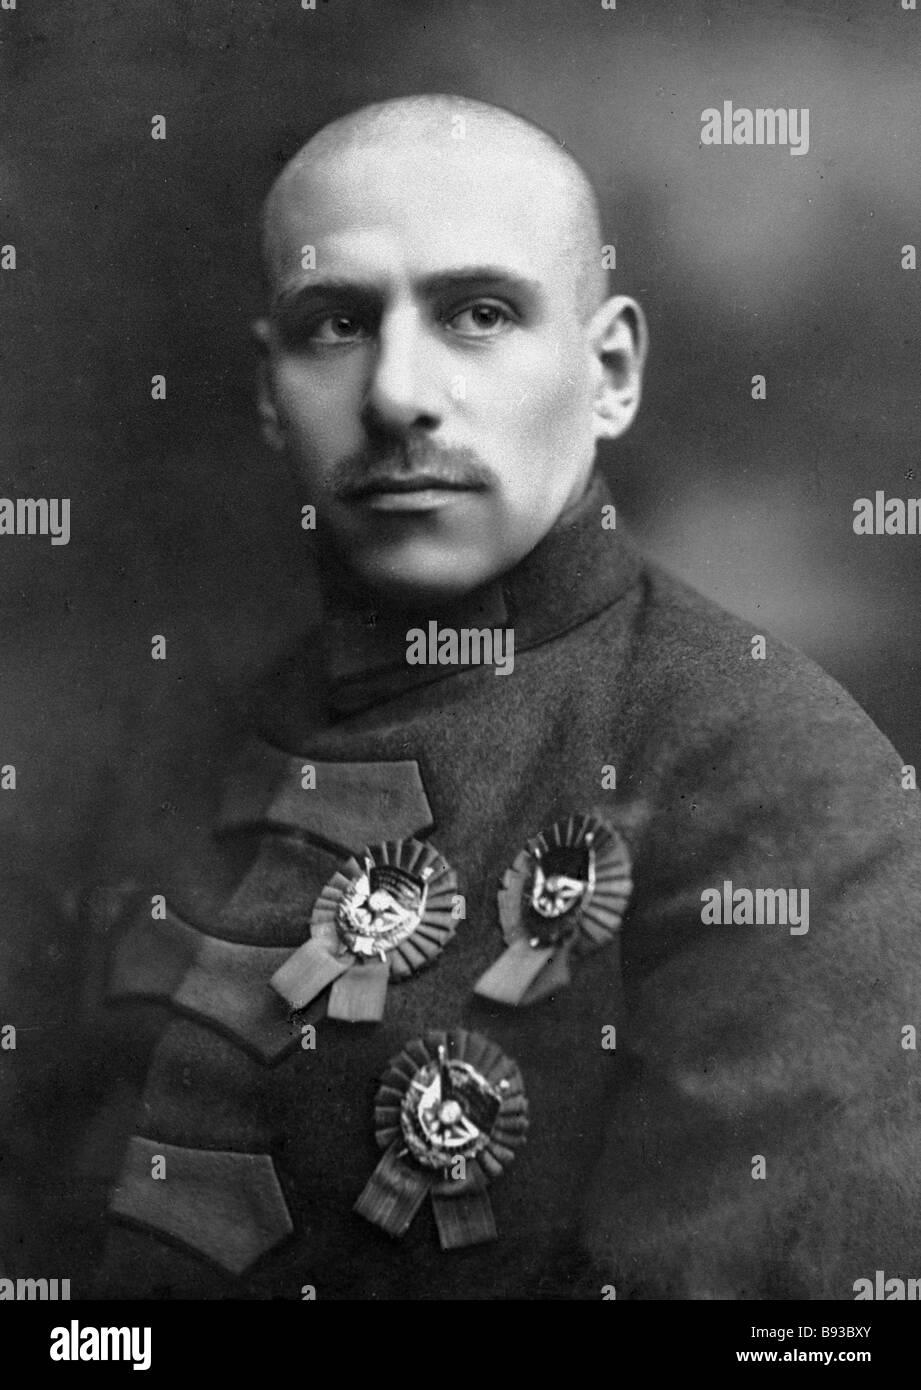 Commander of 51 Rifle Division Vasily Blyukher - Stock Image